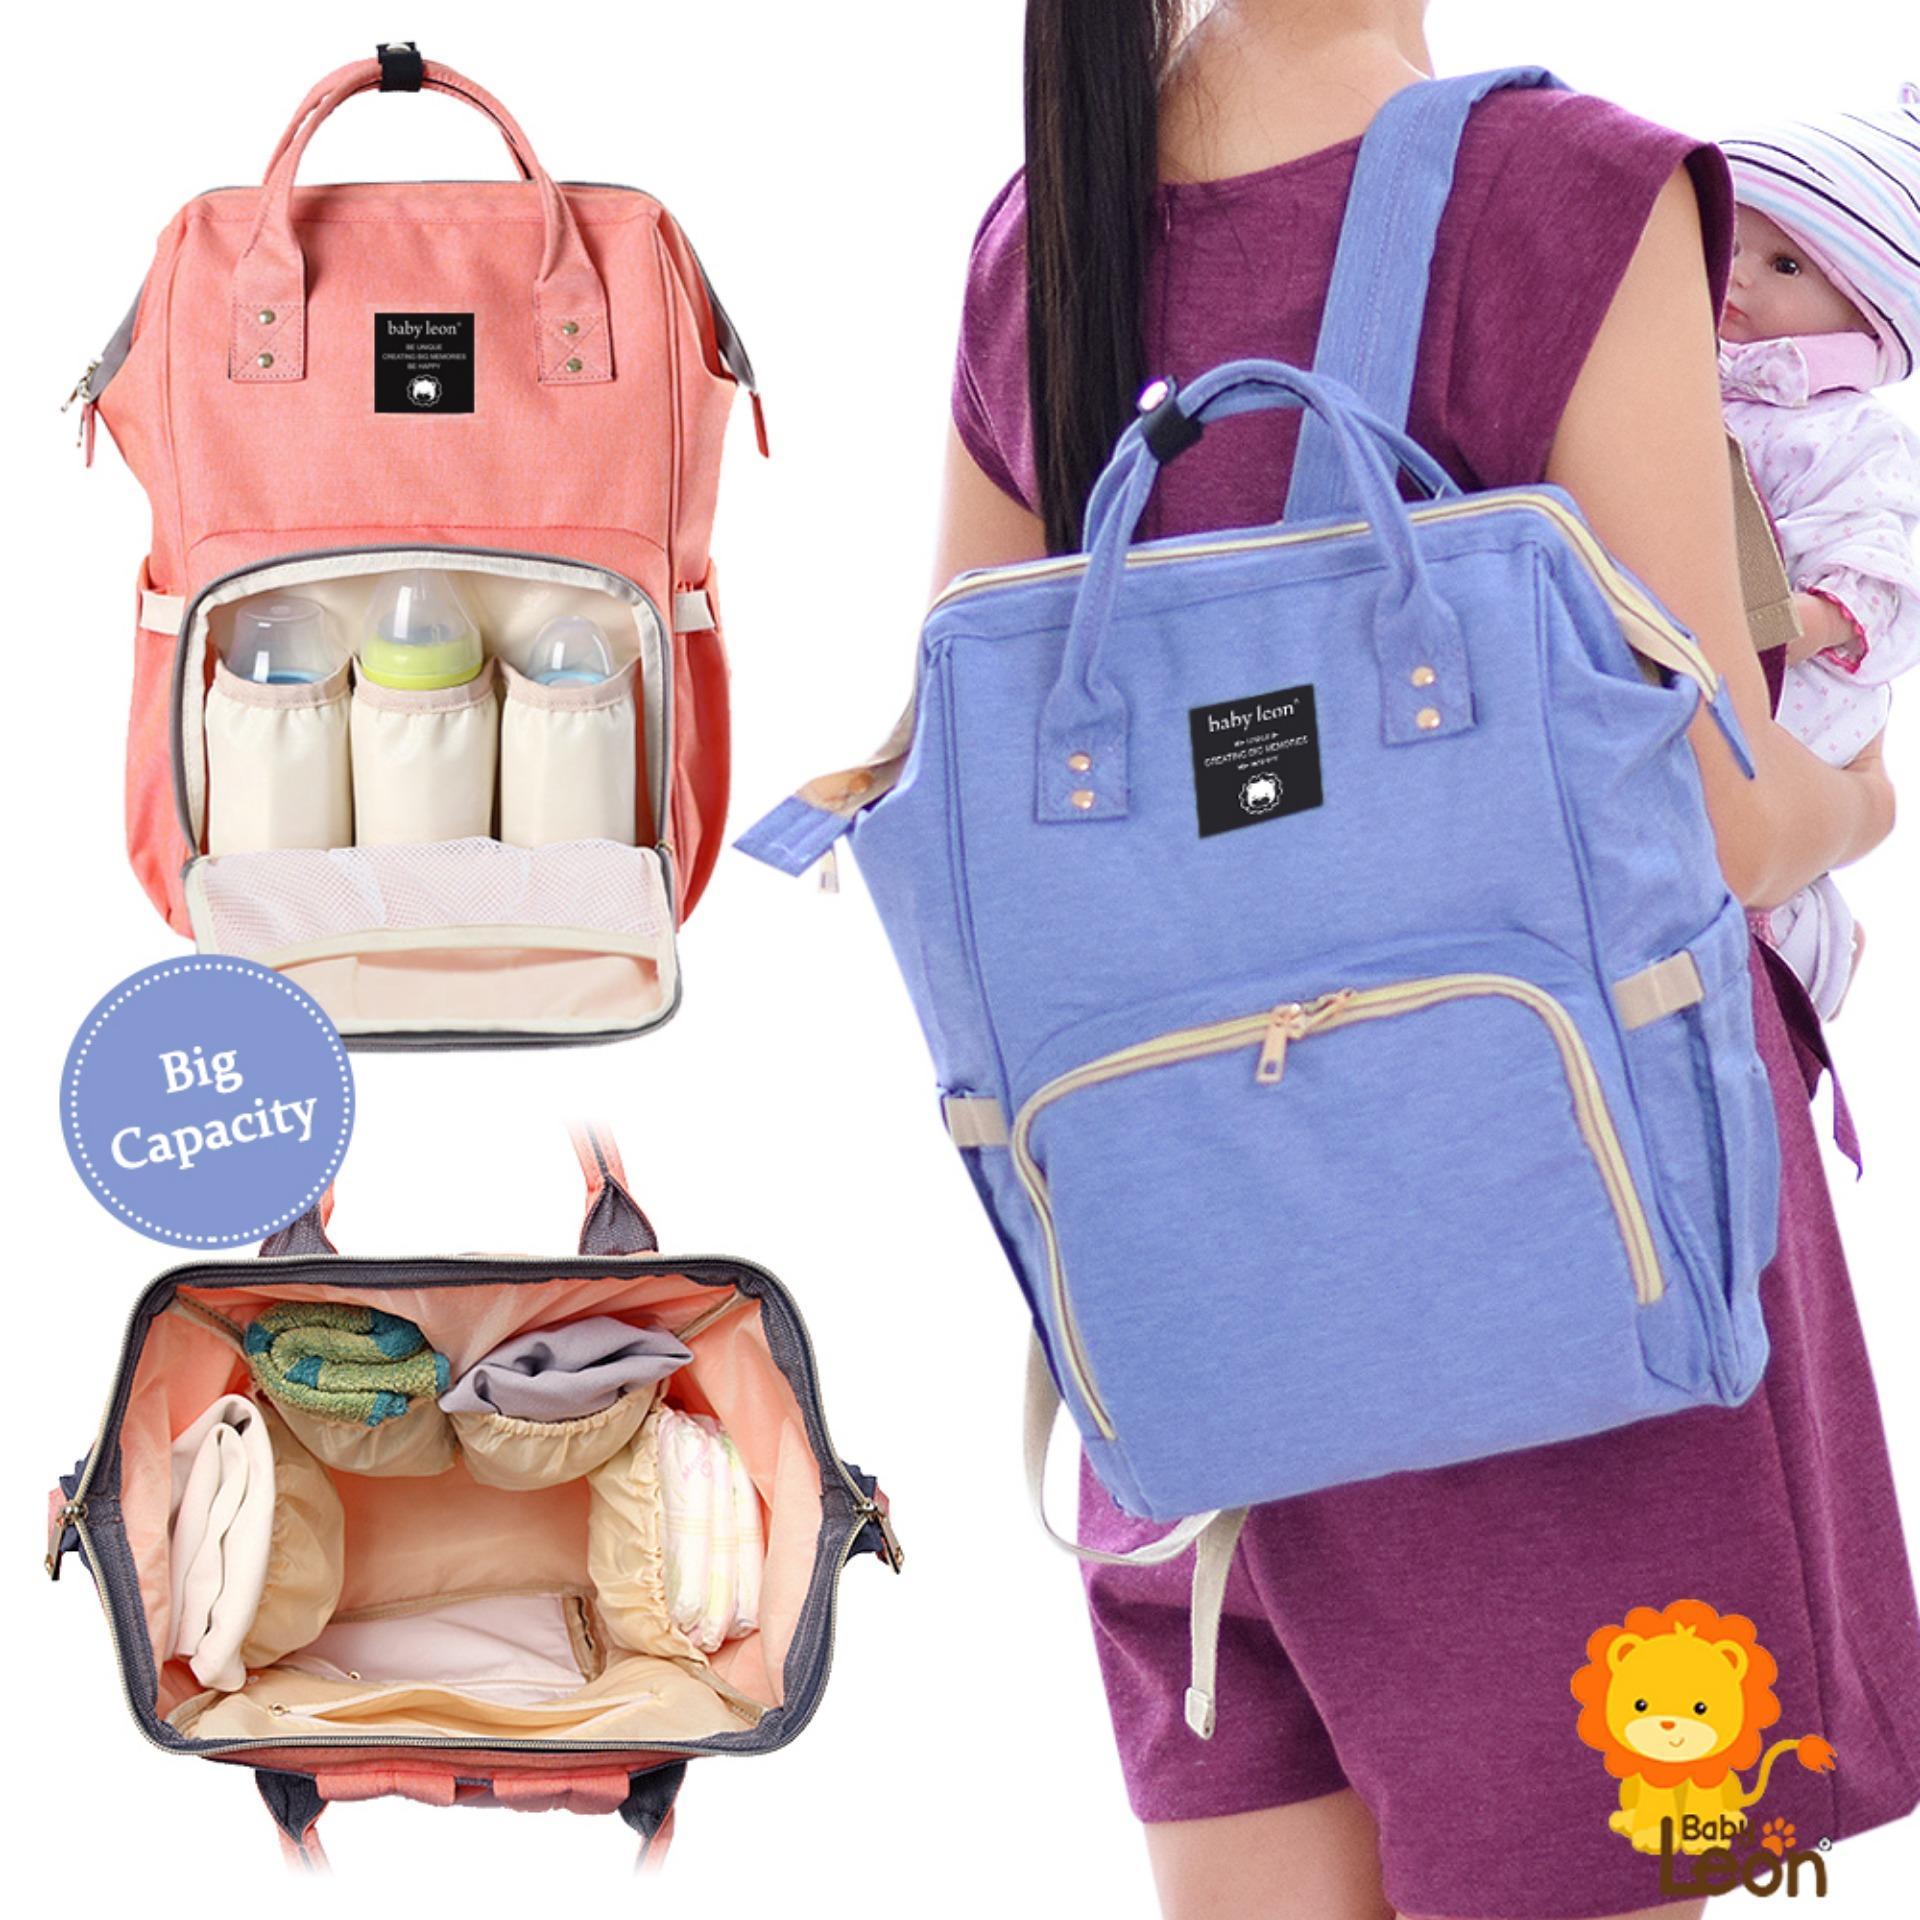 Tas bayi Backpack BABYLEON / Tas Perlengkapan Baby / Ransel / Tas Popok / Diaper Bag FS HS-899 - Blue